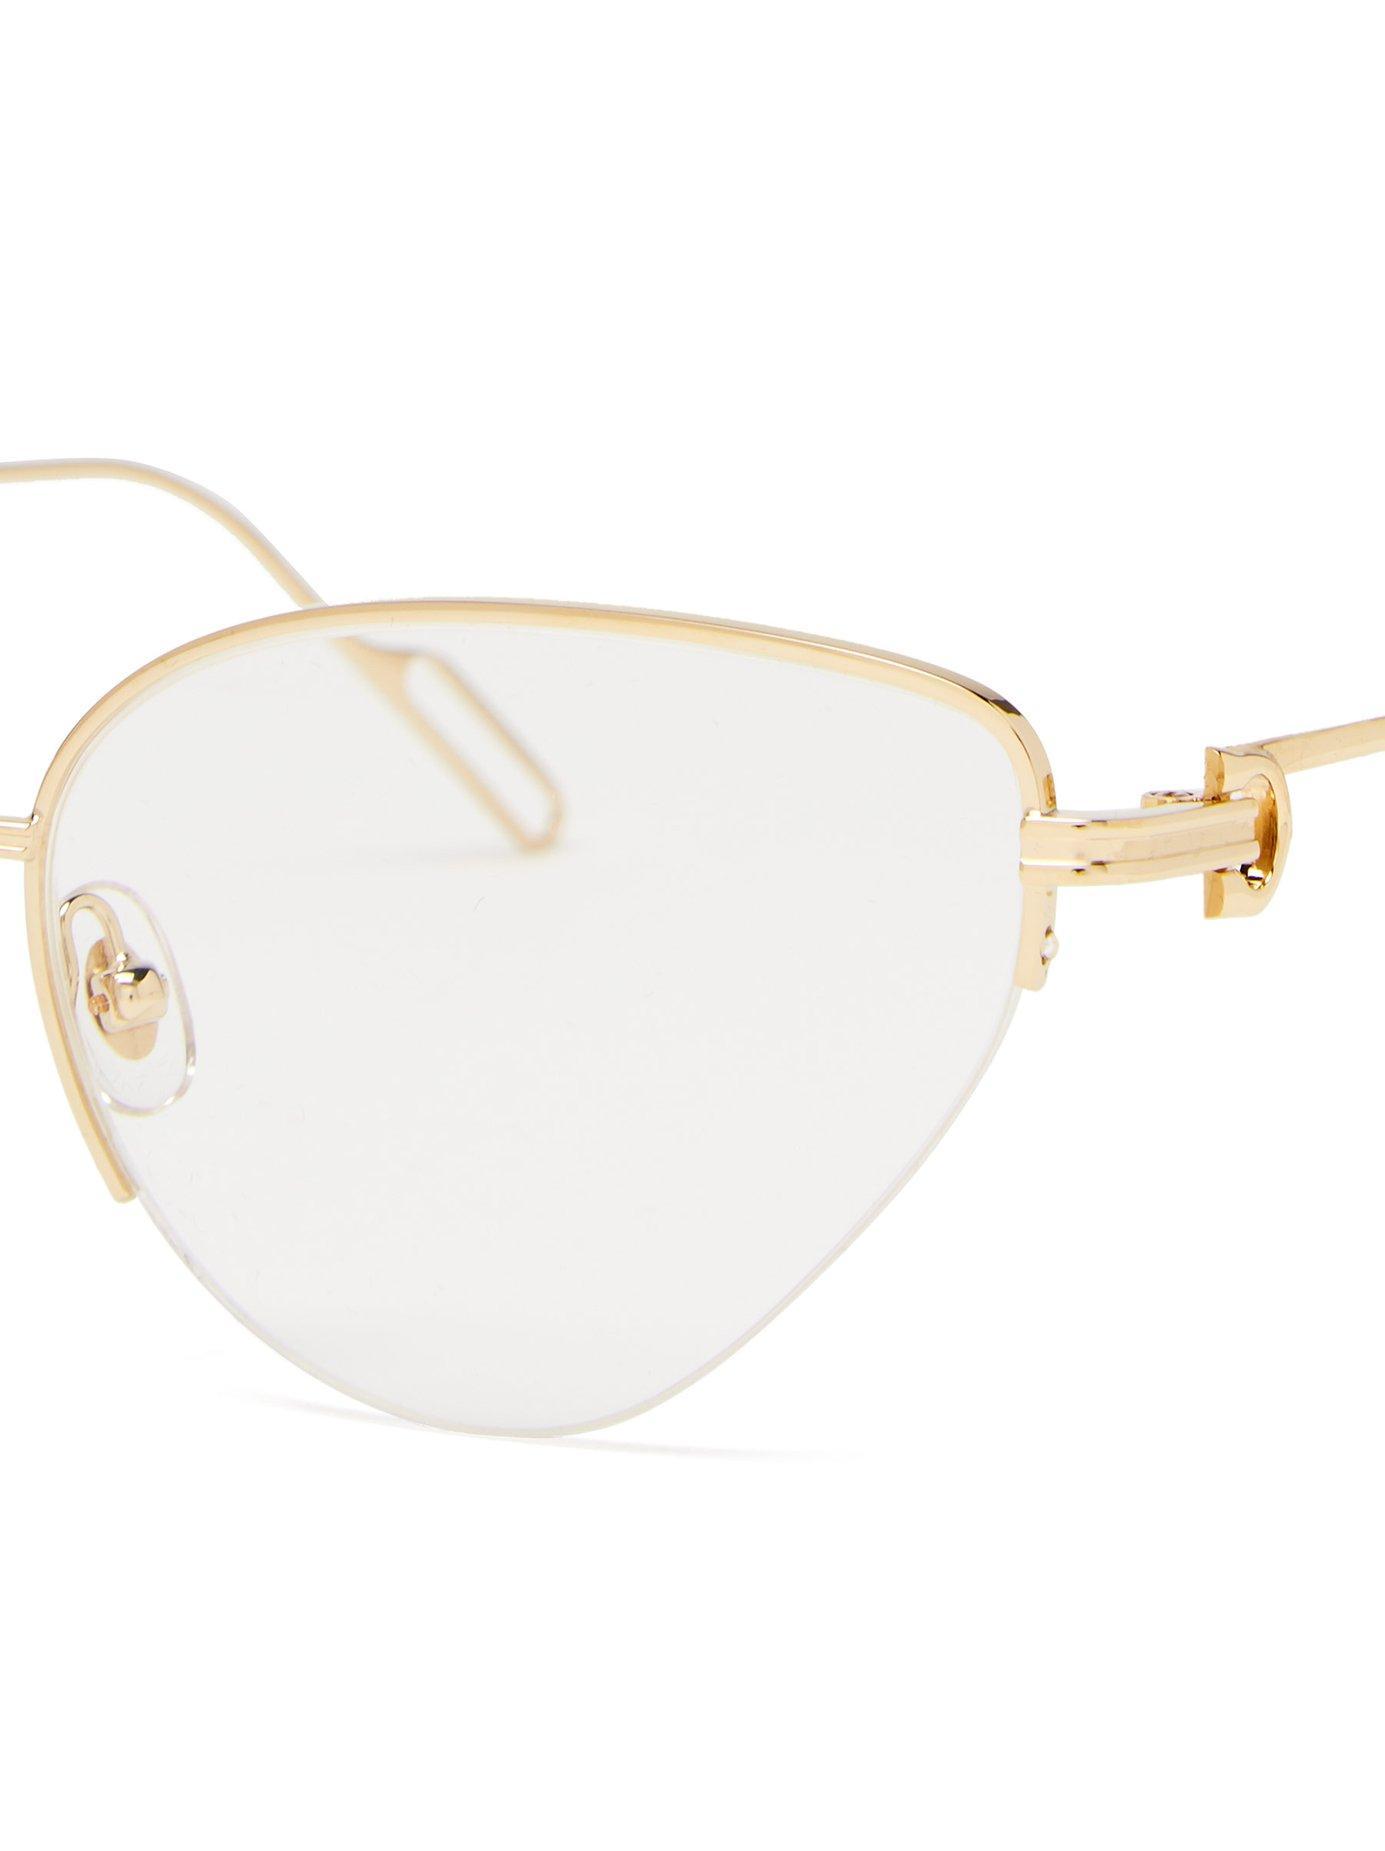 Cartier Première Metallic Lyst De Glasses Metal Cat Eye In 1RFwFxf